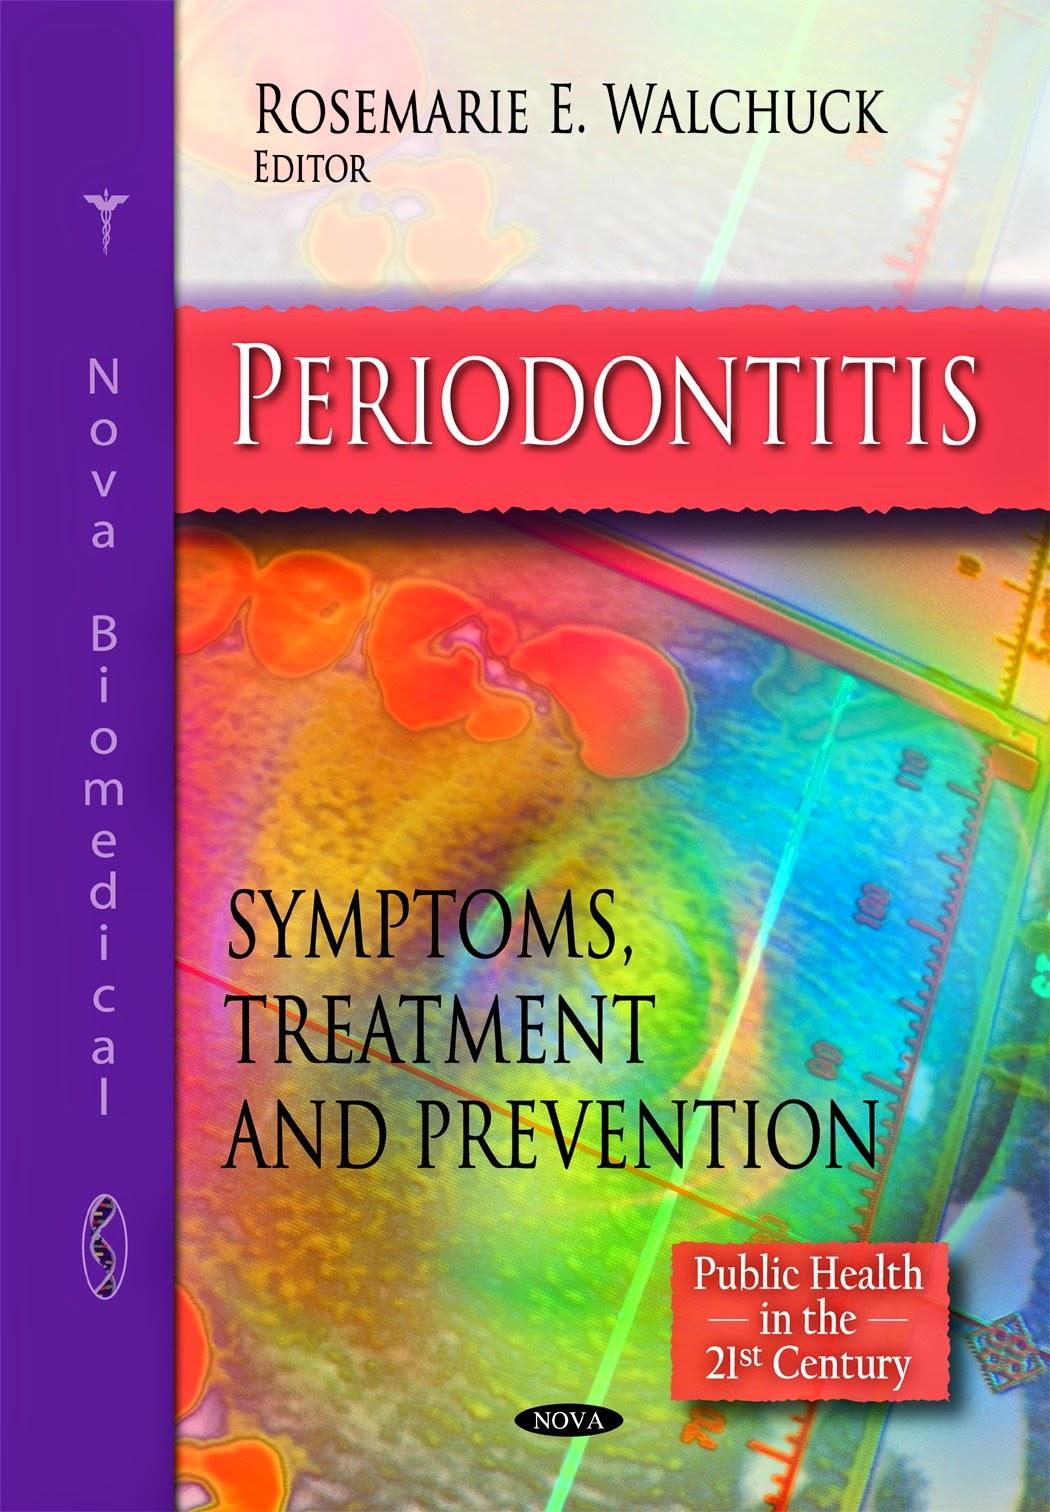 Periodontitis ... Symptoms, Treatment, and Prevention - ROSEMARIE E. WALCHUCK © 2010.PDF